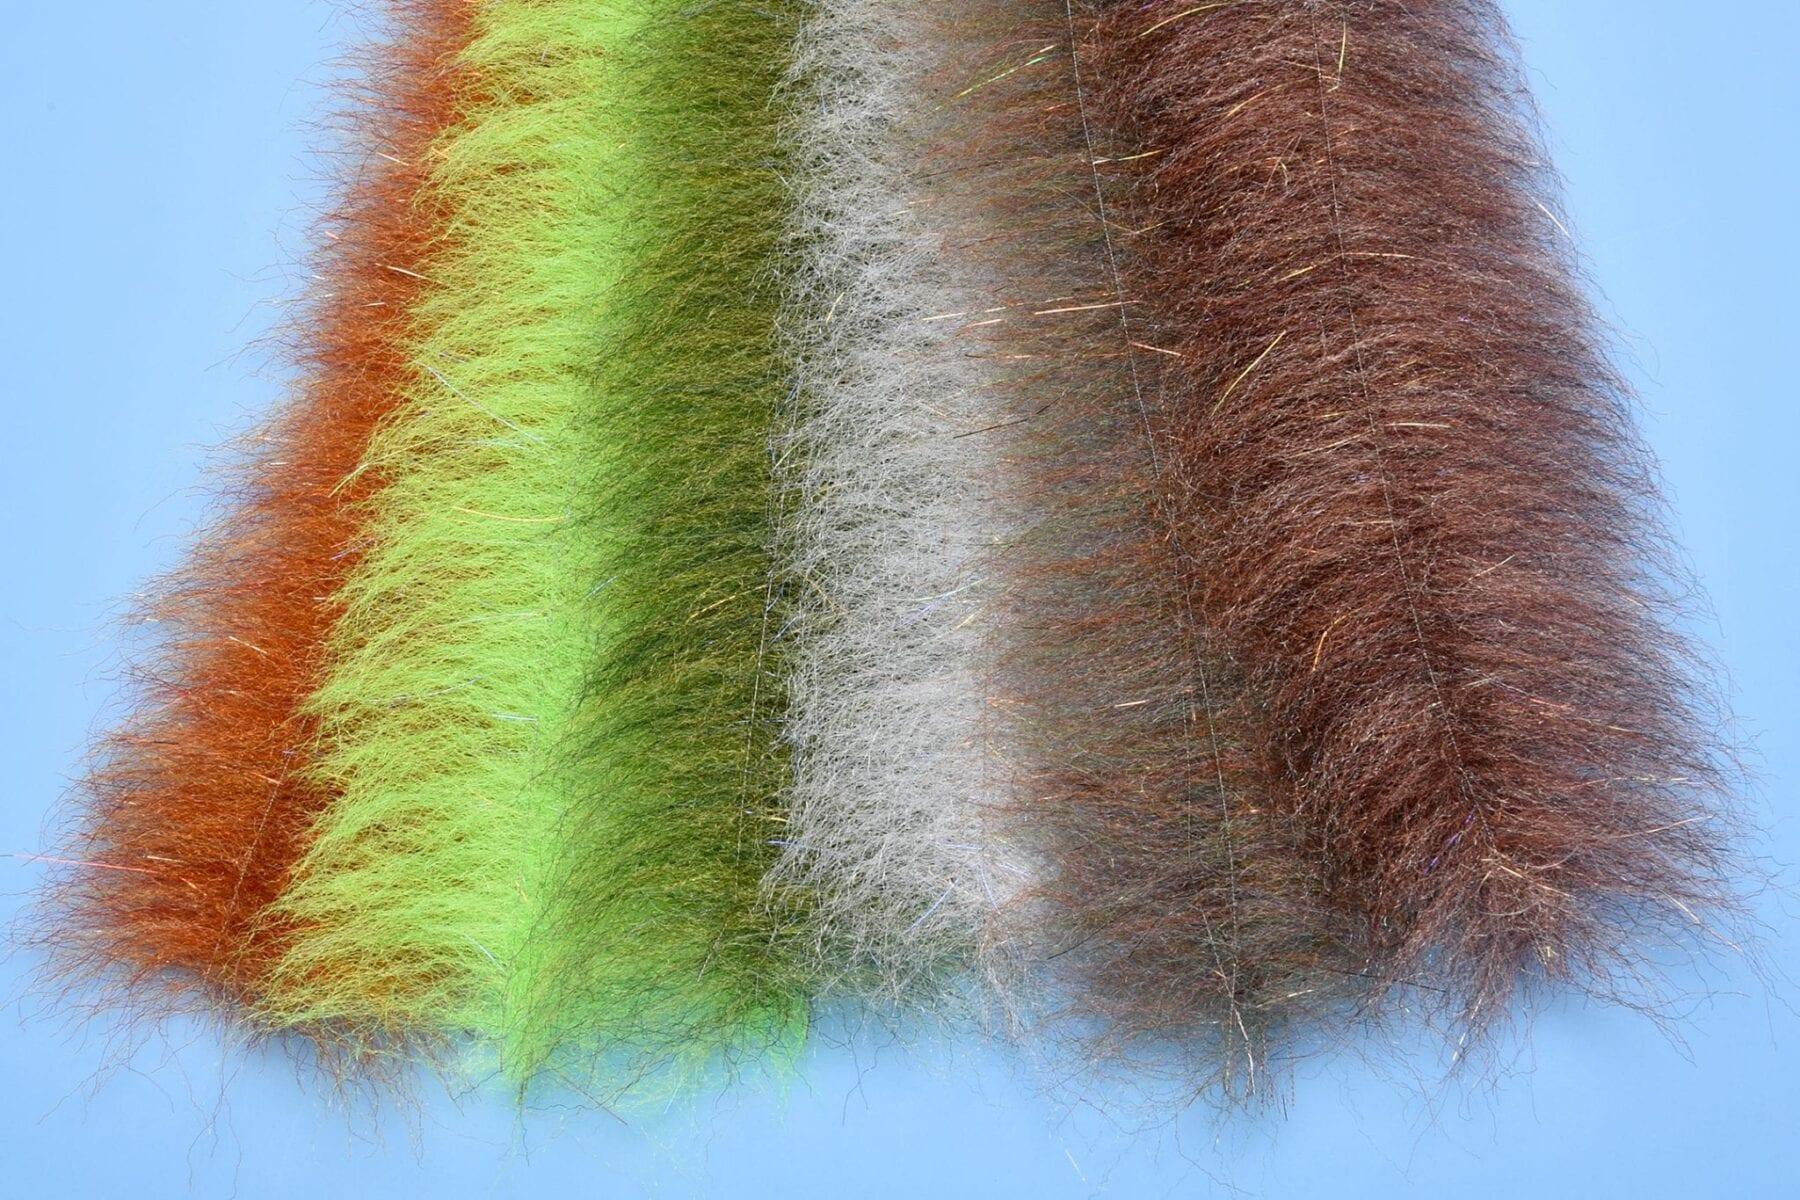 Enrico Puglisi 2.5 inch Streamer Brush Tan Fly Tying Materials BWCflies